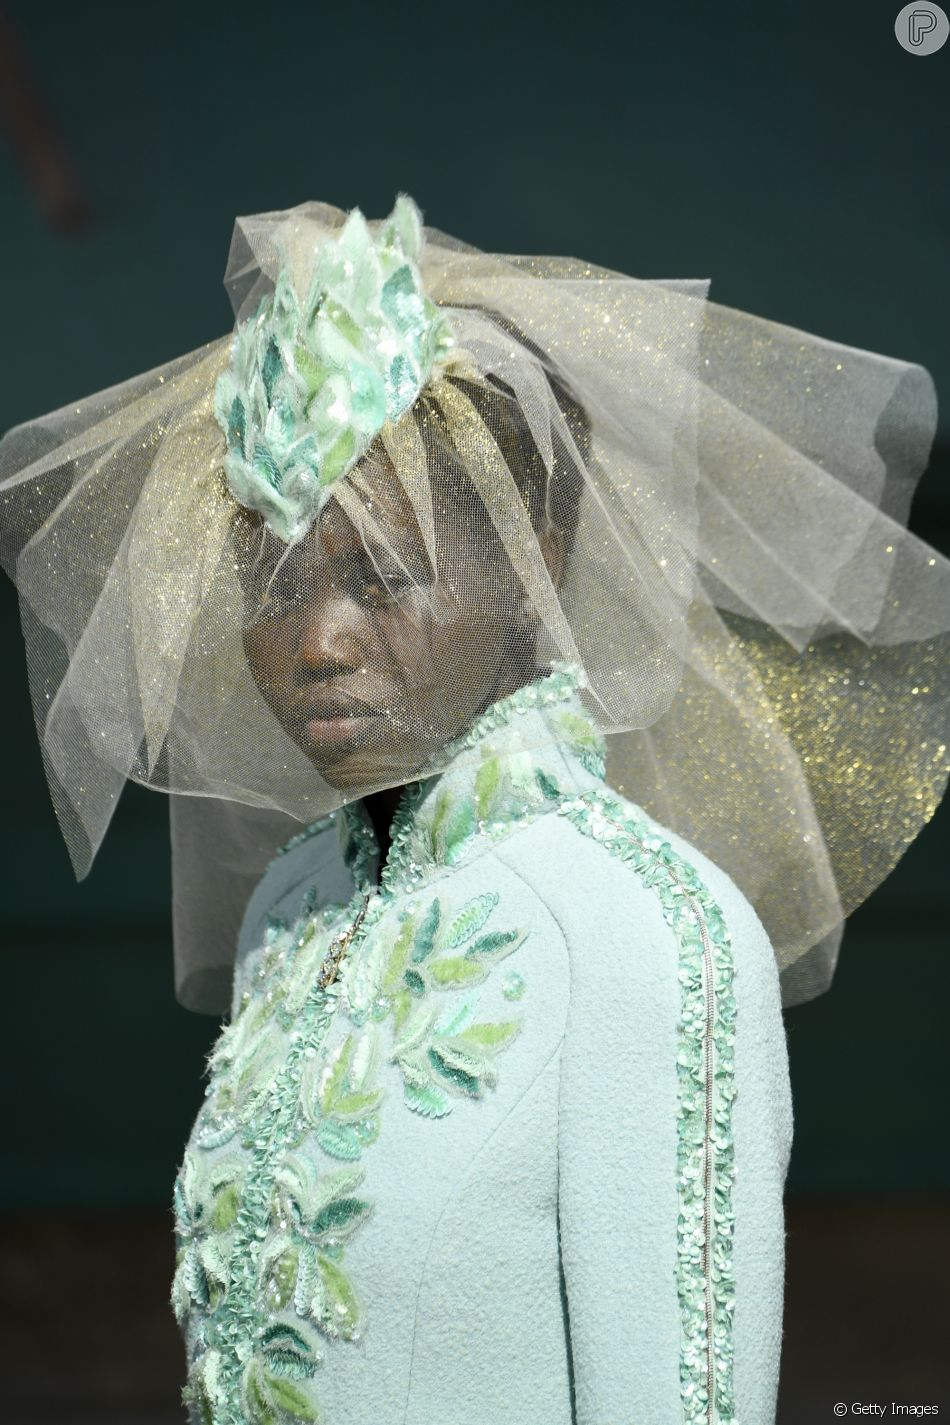 bda8b352d Nesta temporada de alta-costura, Adut Akech entrou na passarela da  Givenchy, Dior e Chanel